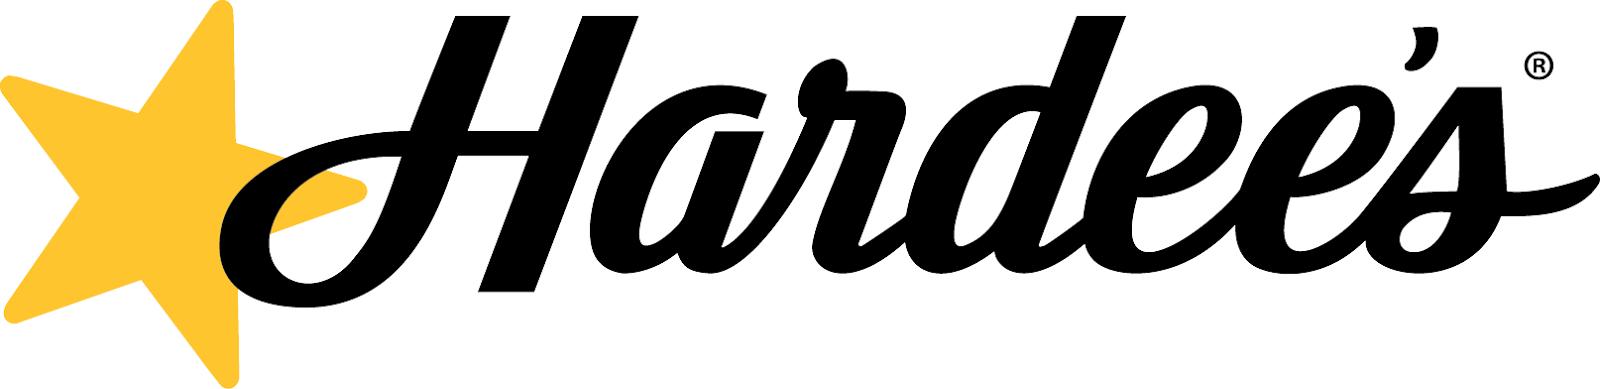 Old Hardee\'s Logo.